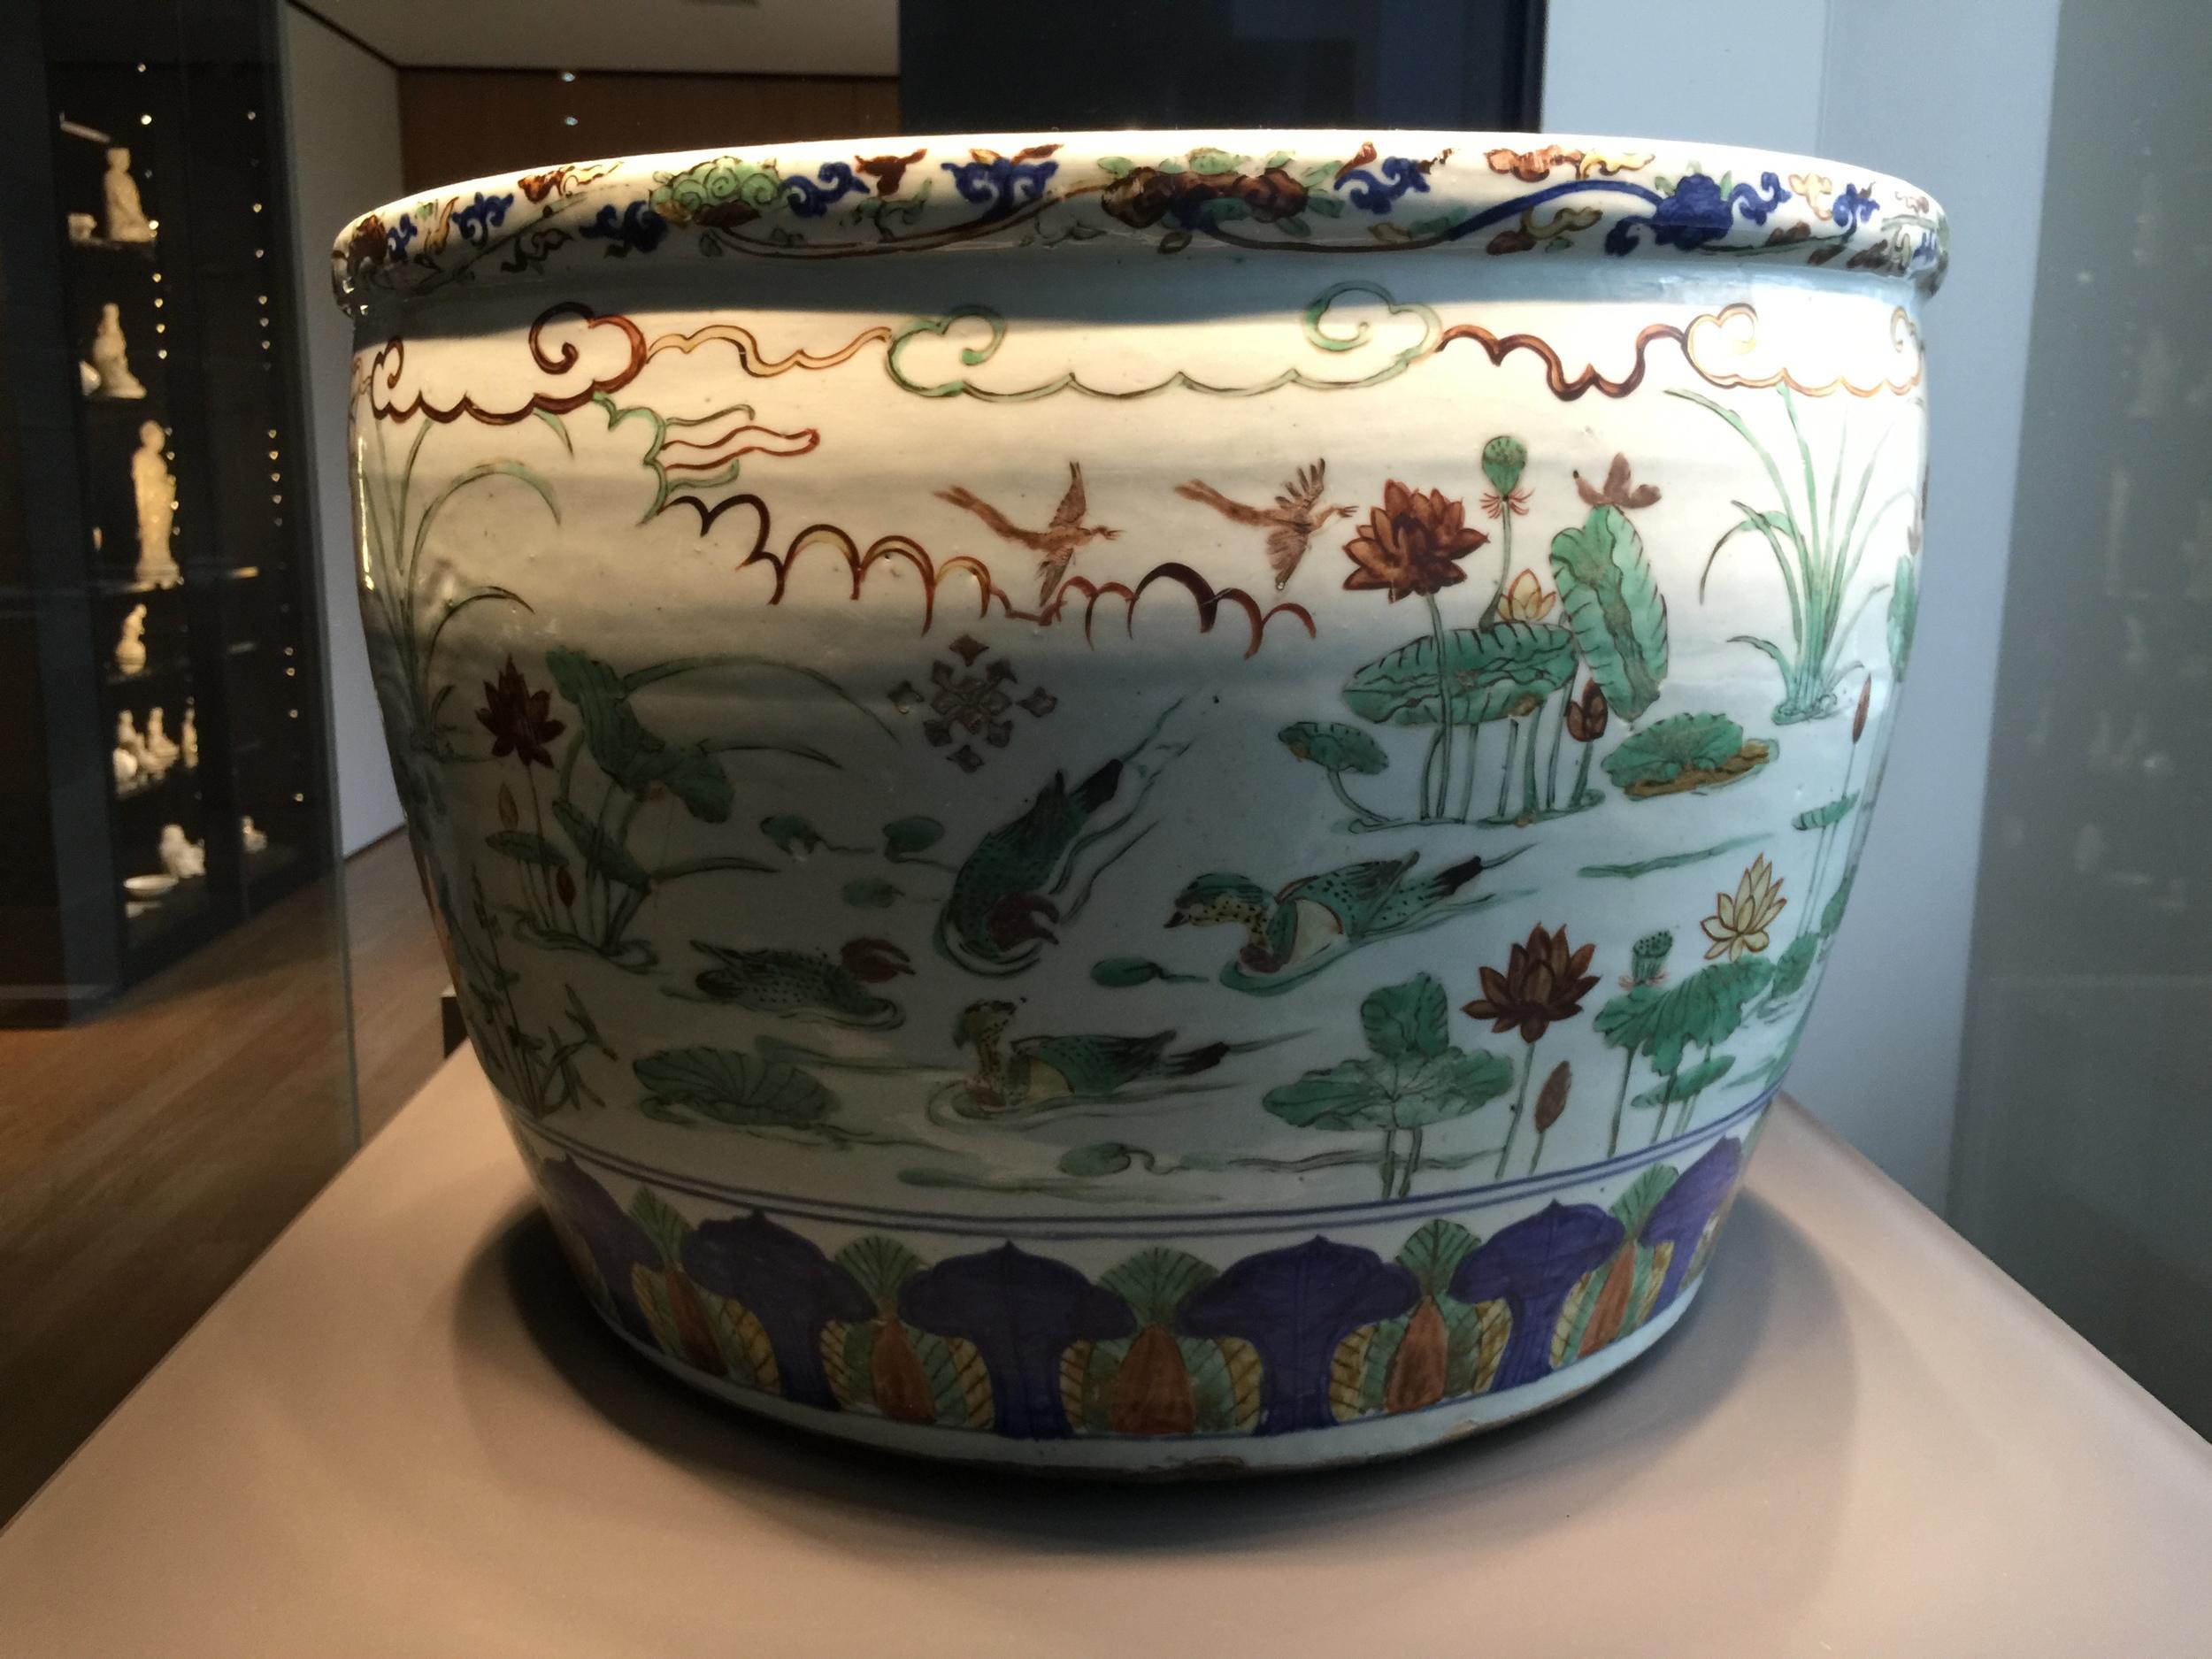 Chinese-Porcelain-British-Museum-Percival-David-jessewaugh.com-22.jpg